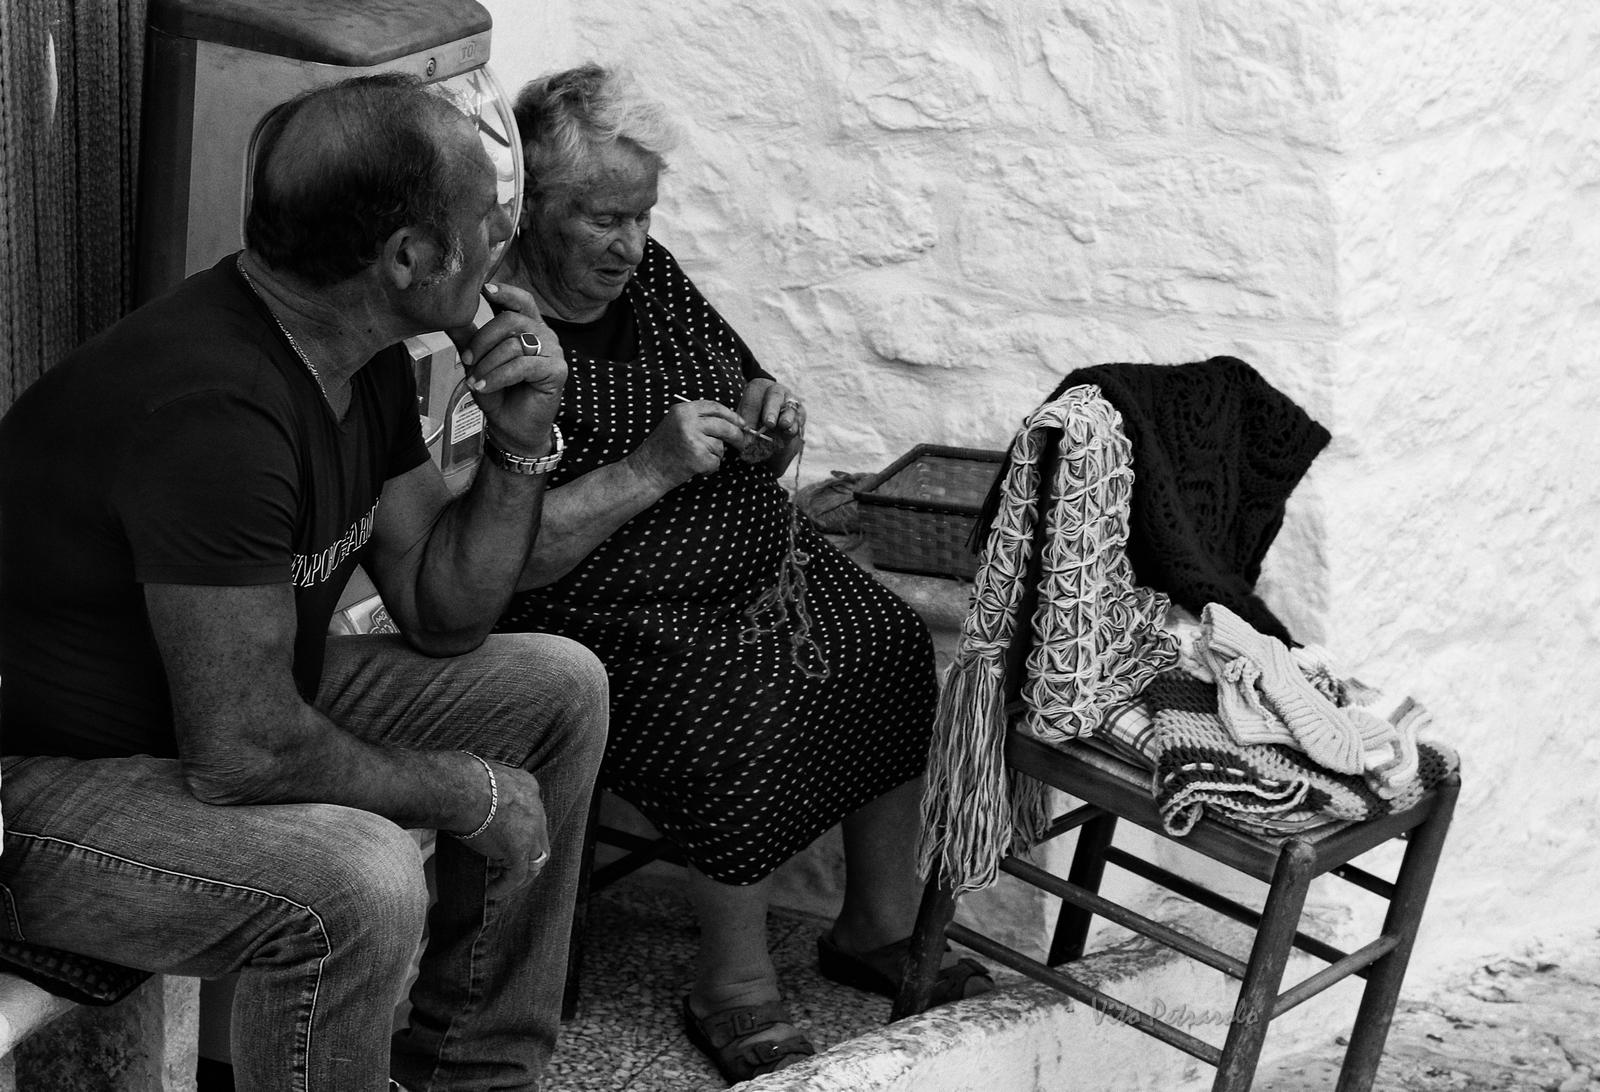 Donna che ricama e cuce tra i trulli